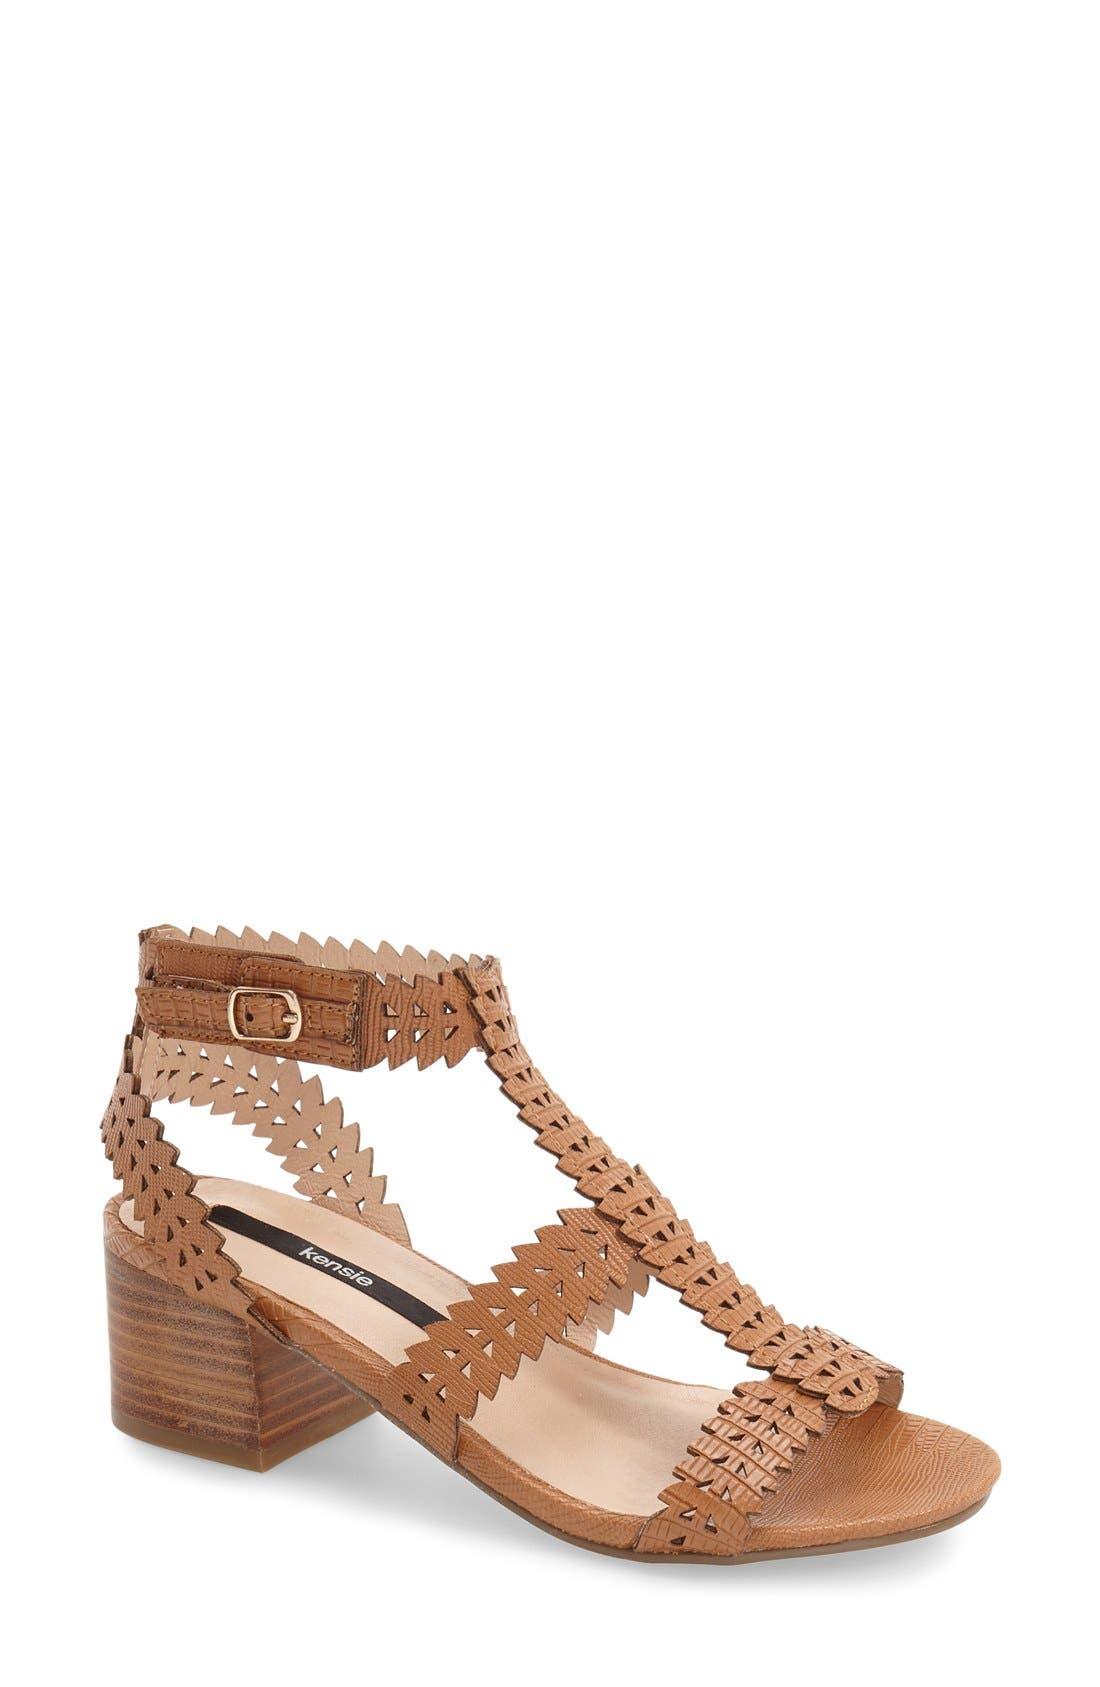 Main Image - kensie 'Hepburn' Block Heel Sandal (Women)